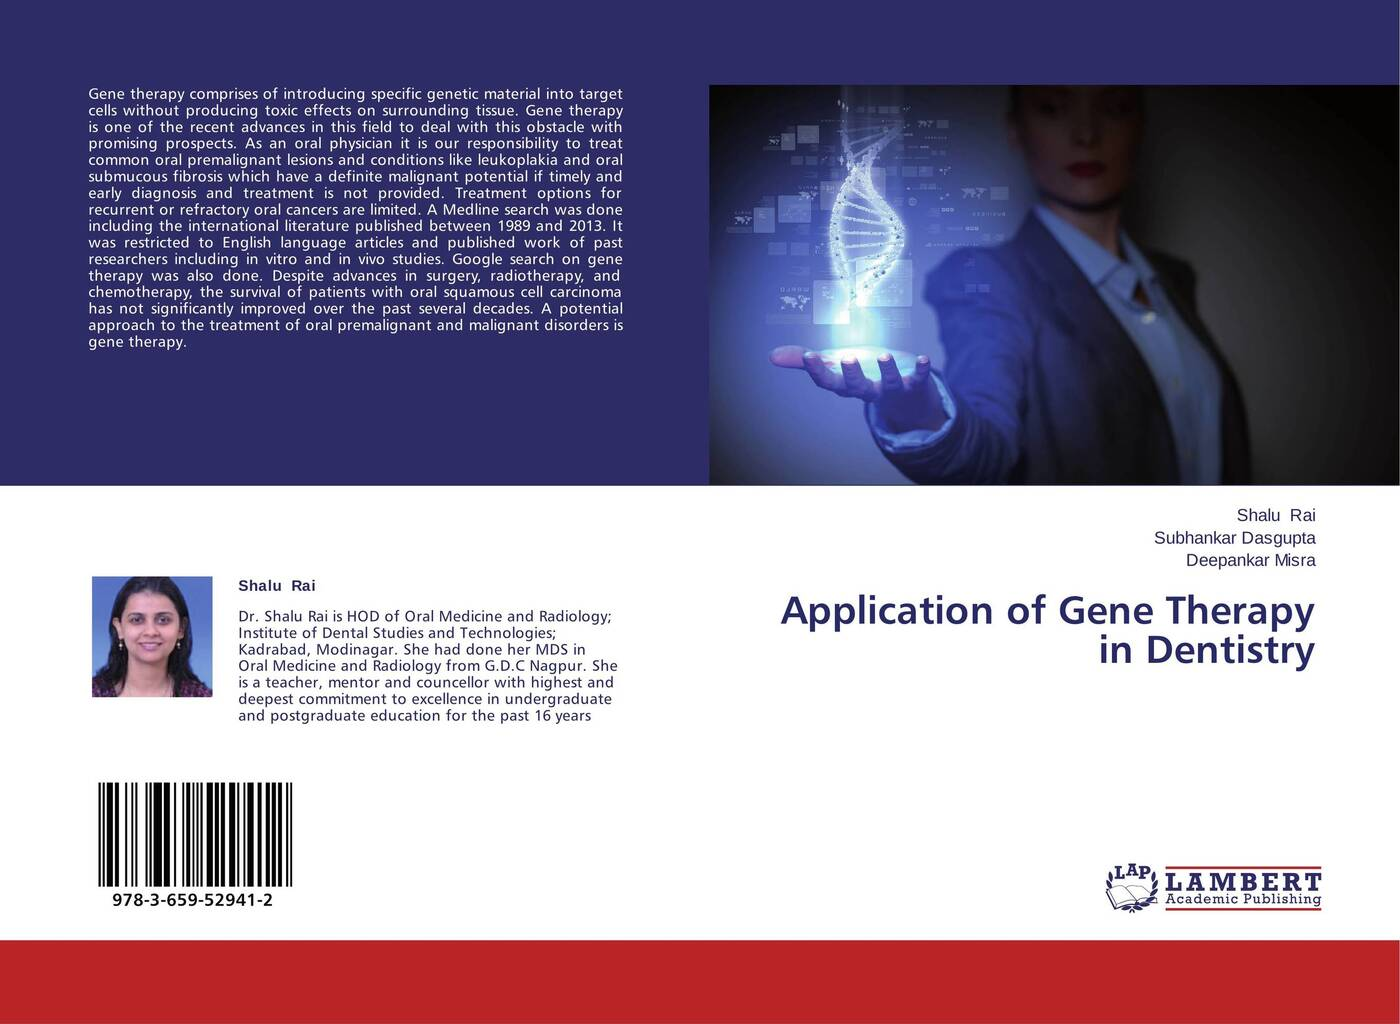 Shalu Rai,Subhankar Dasgupta and Deepankar Misra Application of Gene Therapy in Dentistry oral submucous fibrosis an update